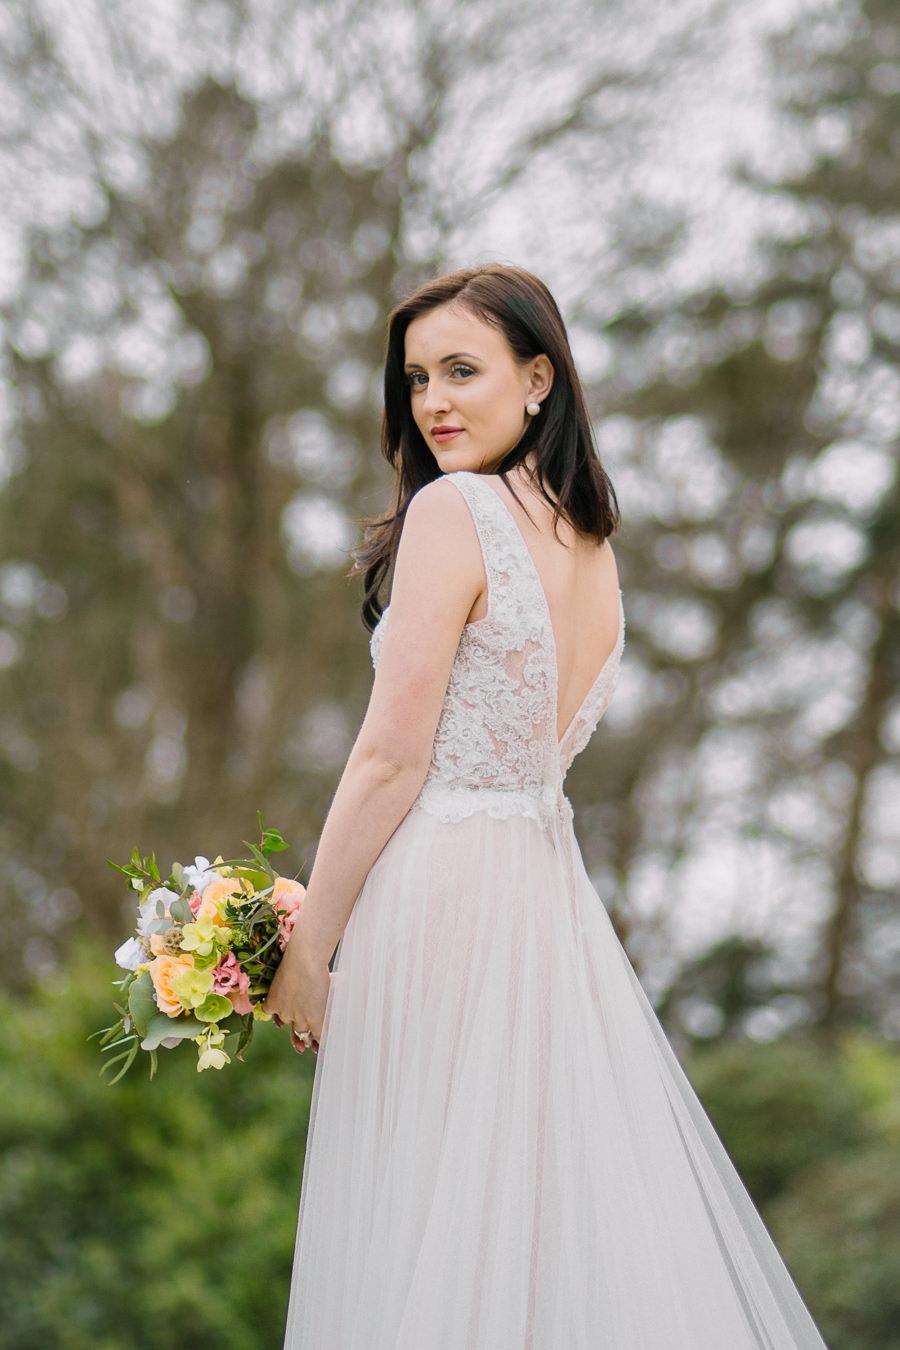 'Understated Elegance' Spring Styled Hampshire Bridal Shoot – Rownhams House, photo credit Nisha Haq Photography (19)